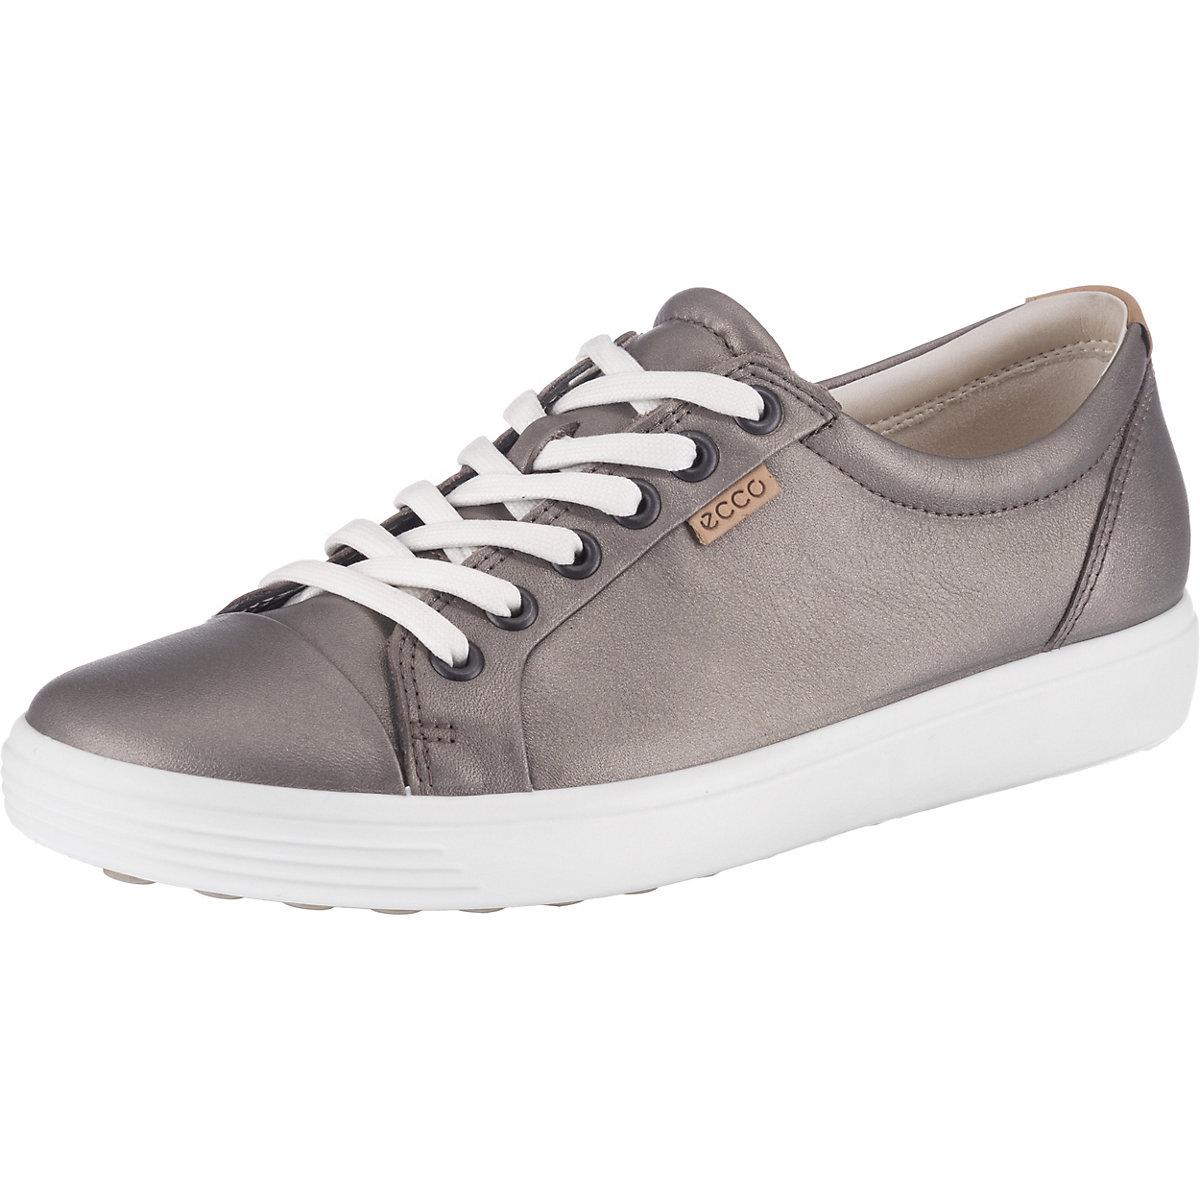 Ecco, ECCO SOFT 7 W Turnschuhe Low, grau  Gute Qualität beliebte Schuhe